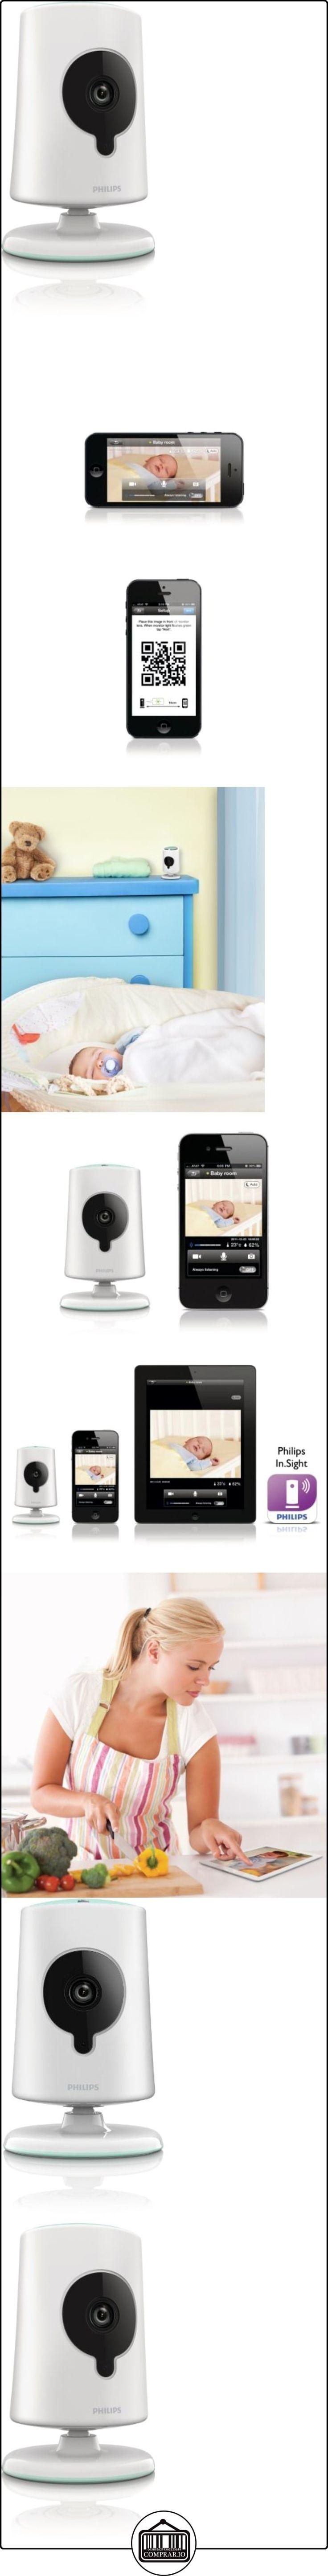 Philips In.Sight HD - Monitor Wi-Fi vigilabebés, 66.2 mm, 66.2 mm, 104 mm, 158 mm, 70 mm, 160 mm  ✿ Vigilabebés - Seguridad ✿ ▬► Ver oferta: http://comprar.io/goto/B00962PX14